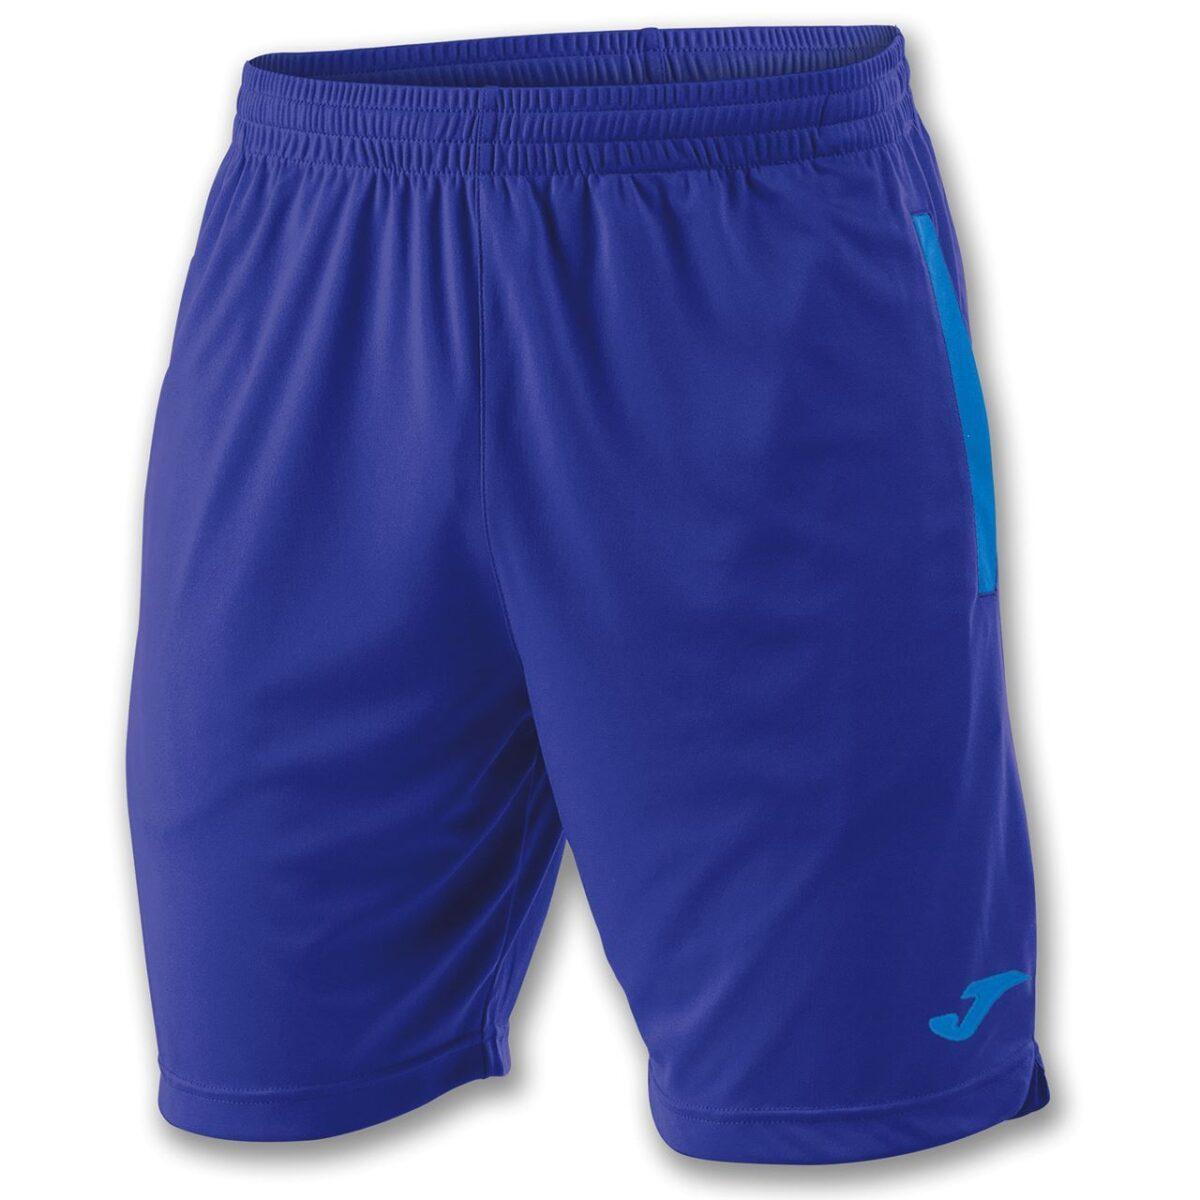 Joma Bermuda Miami - Adult Shorts 100785